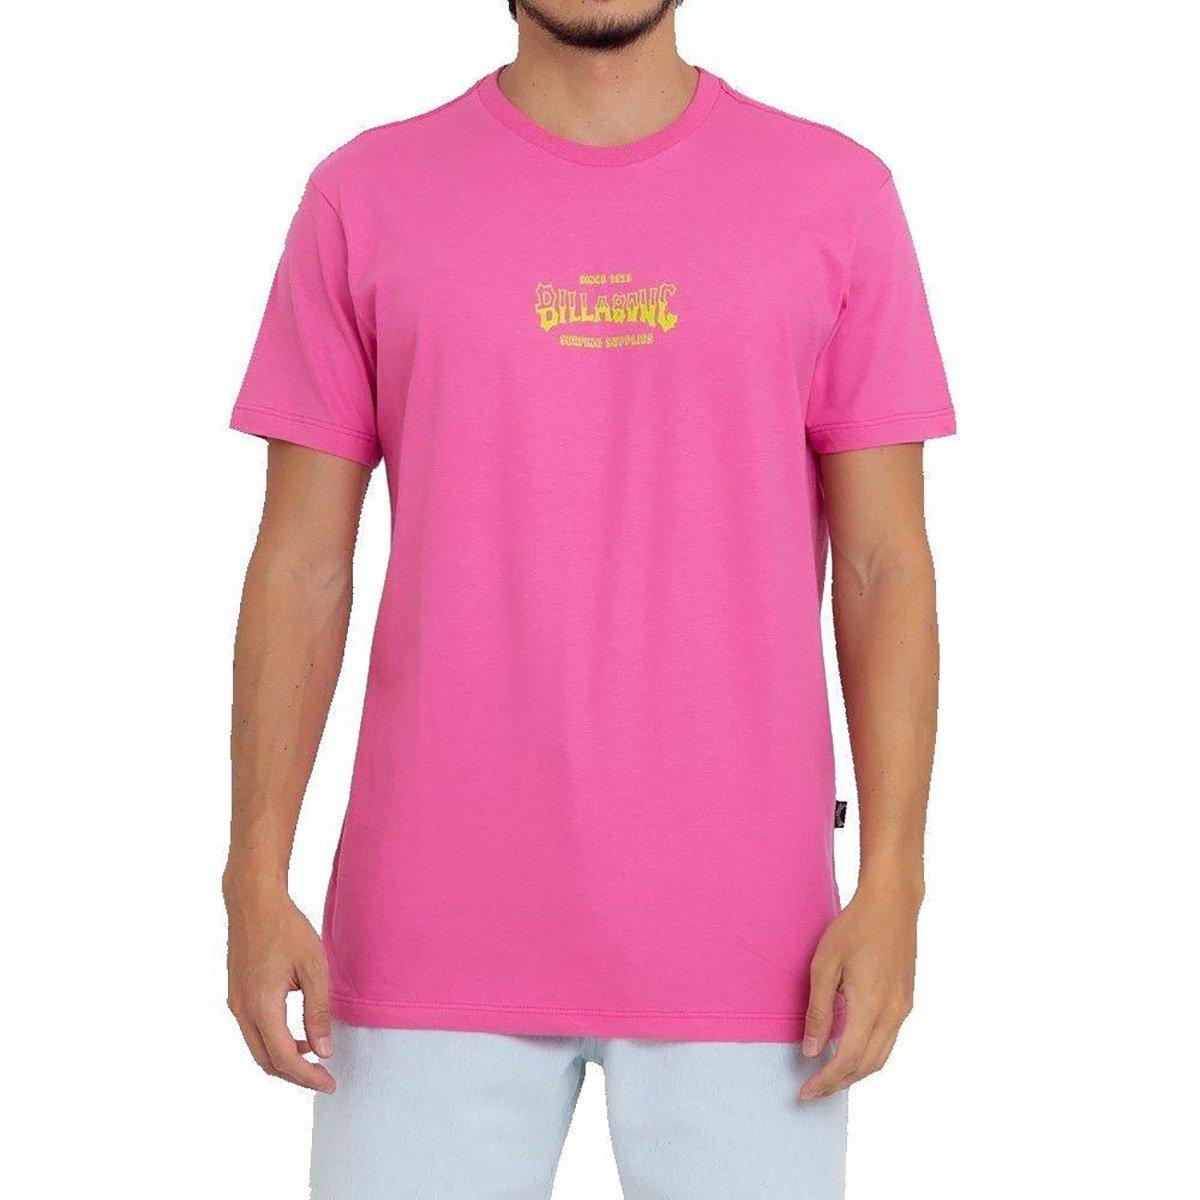 Camiseta Billabong Supply Wave Masculina